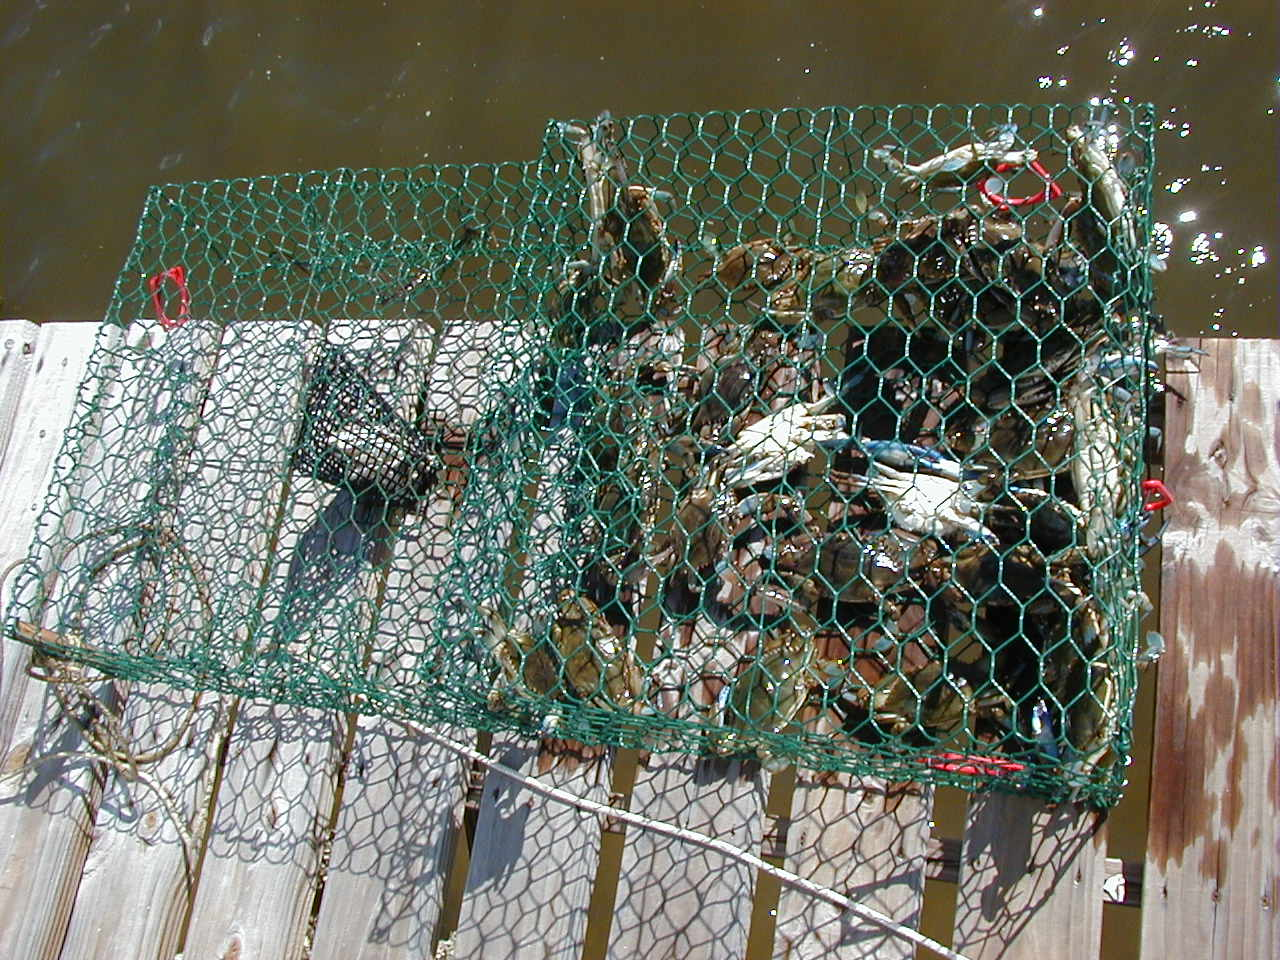 Crab Trap Closure for Florida Panhandle